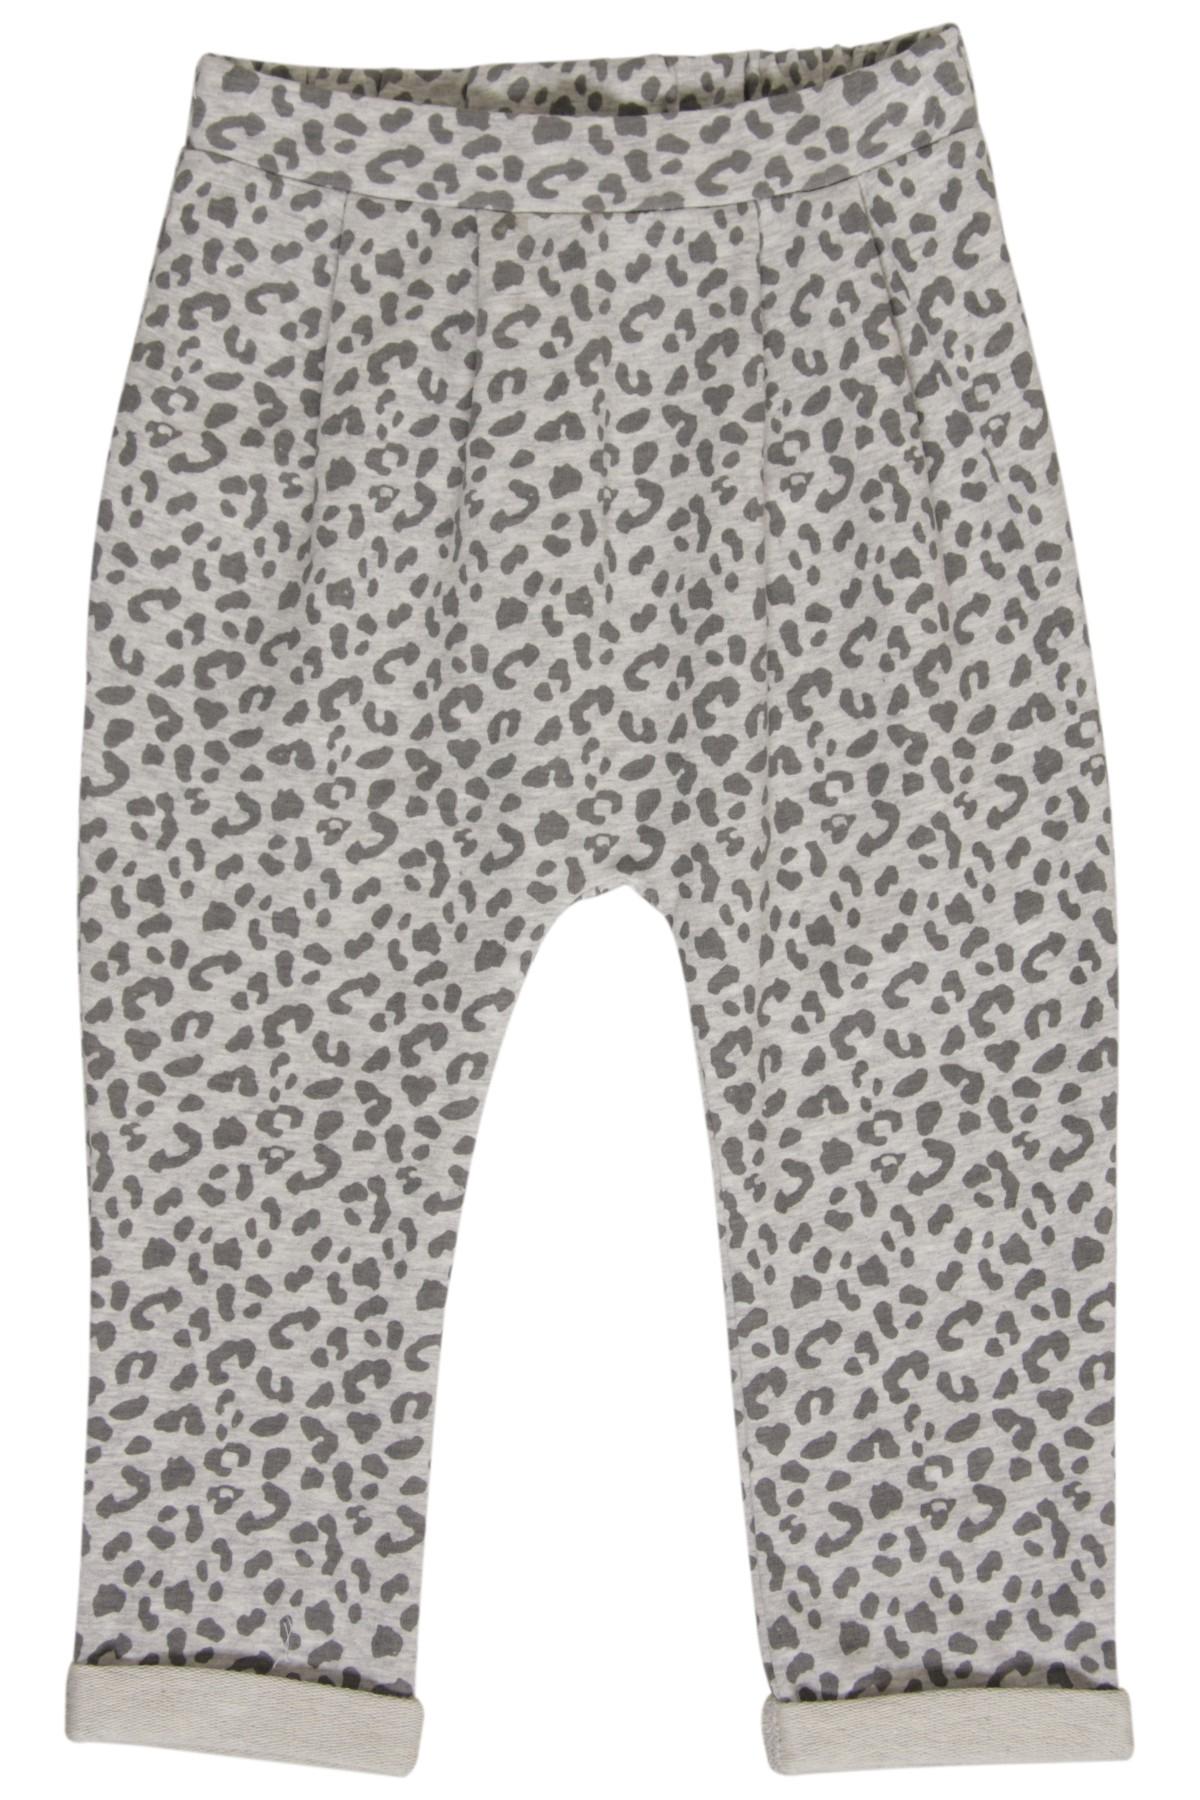 Luipaard broekje